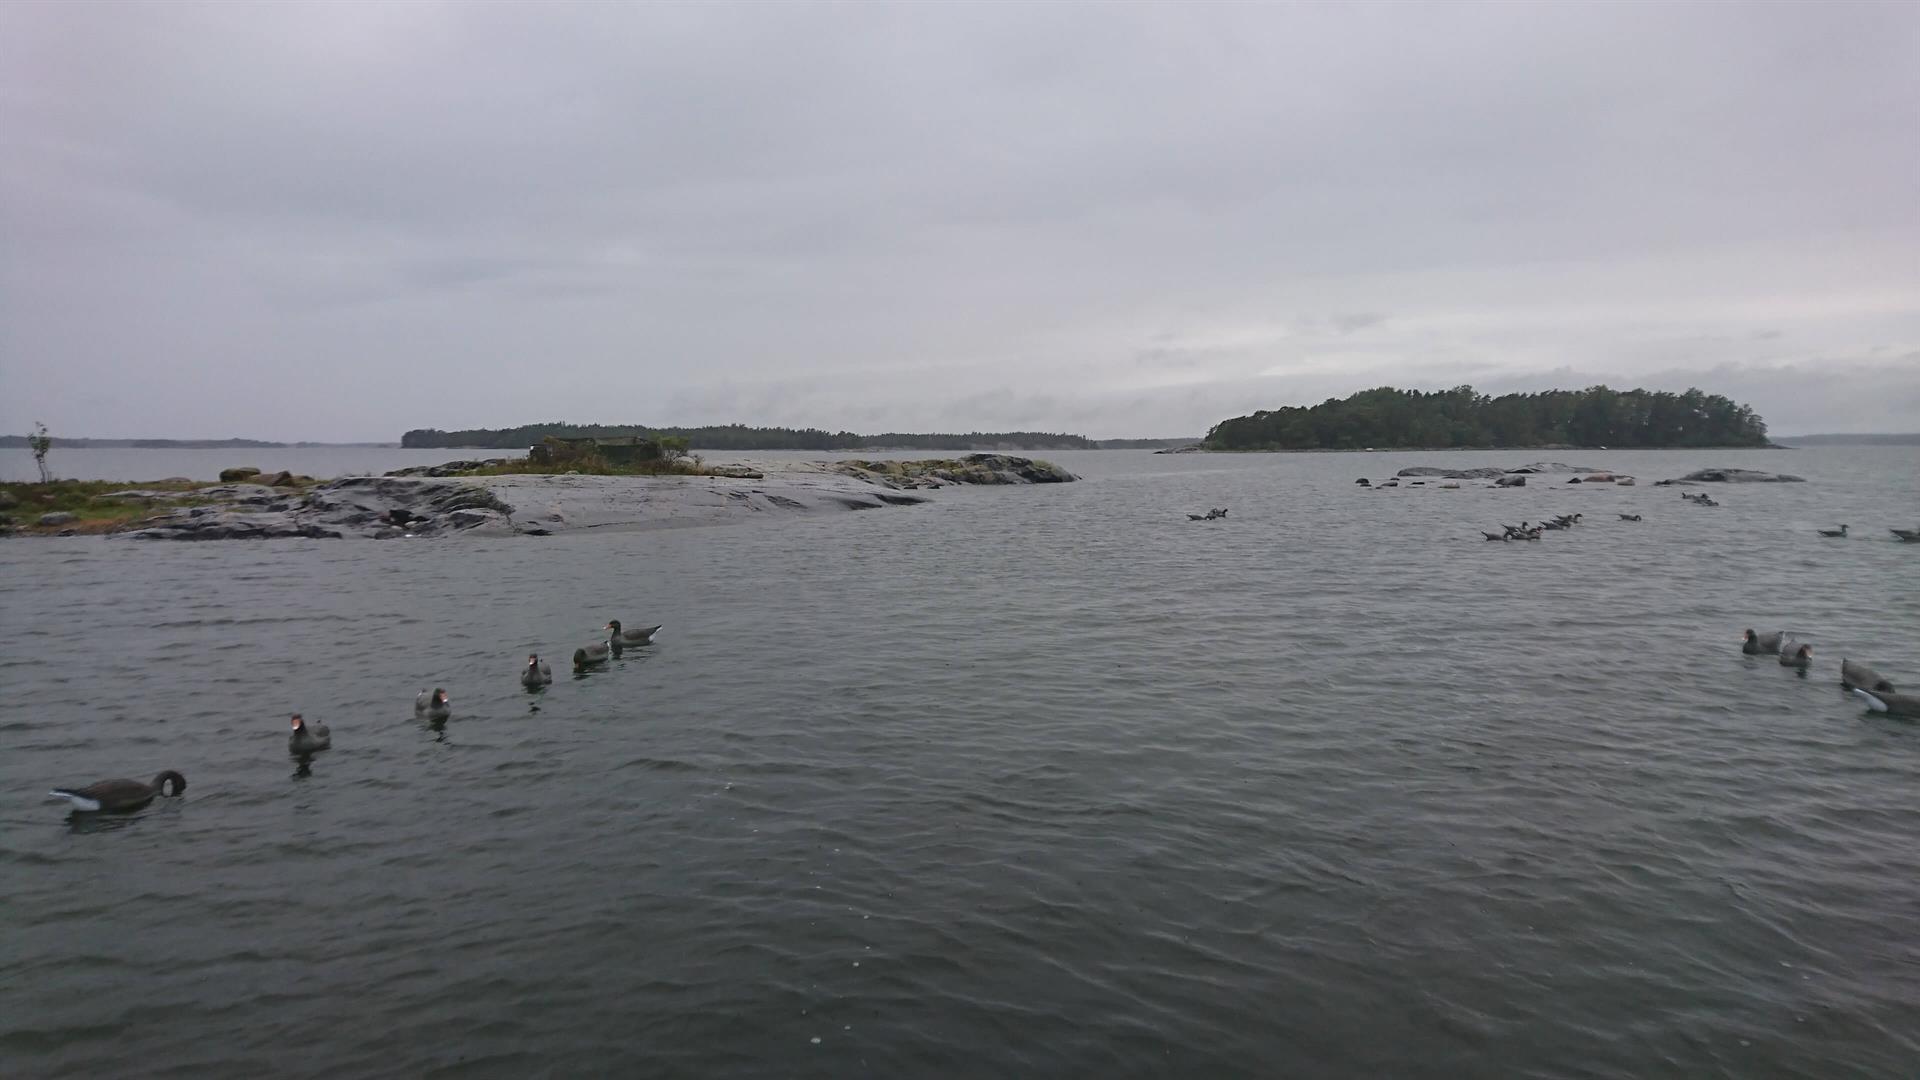 Hanhijahtia Norrby Gårdissa